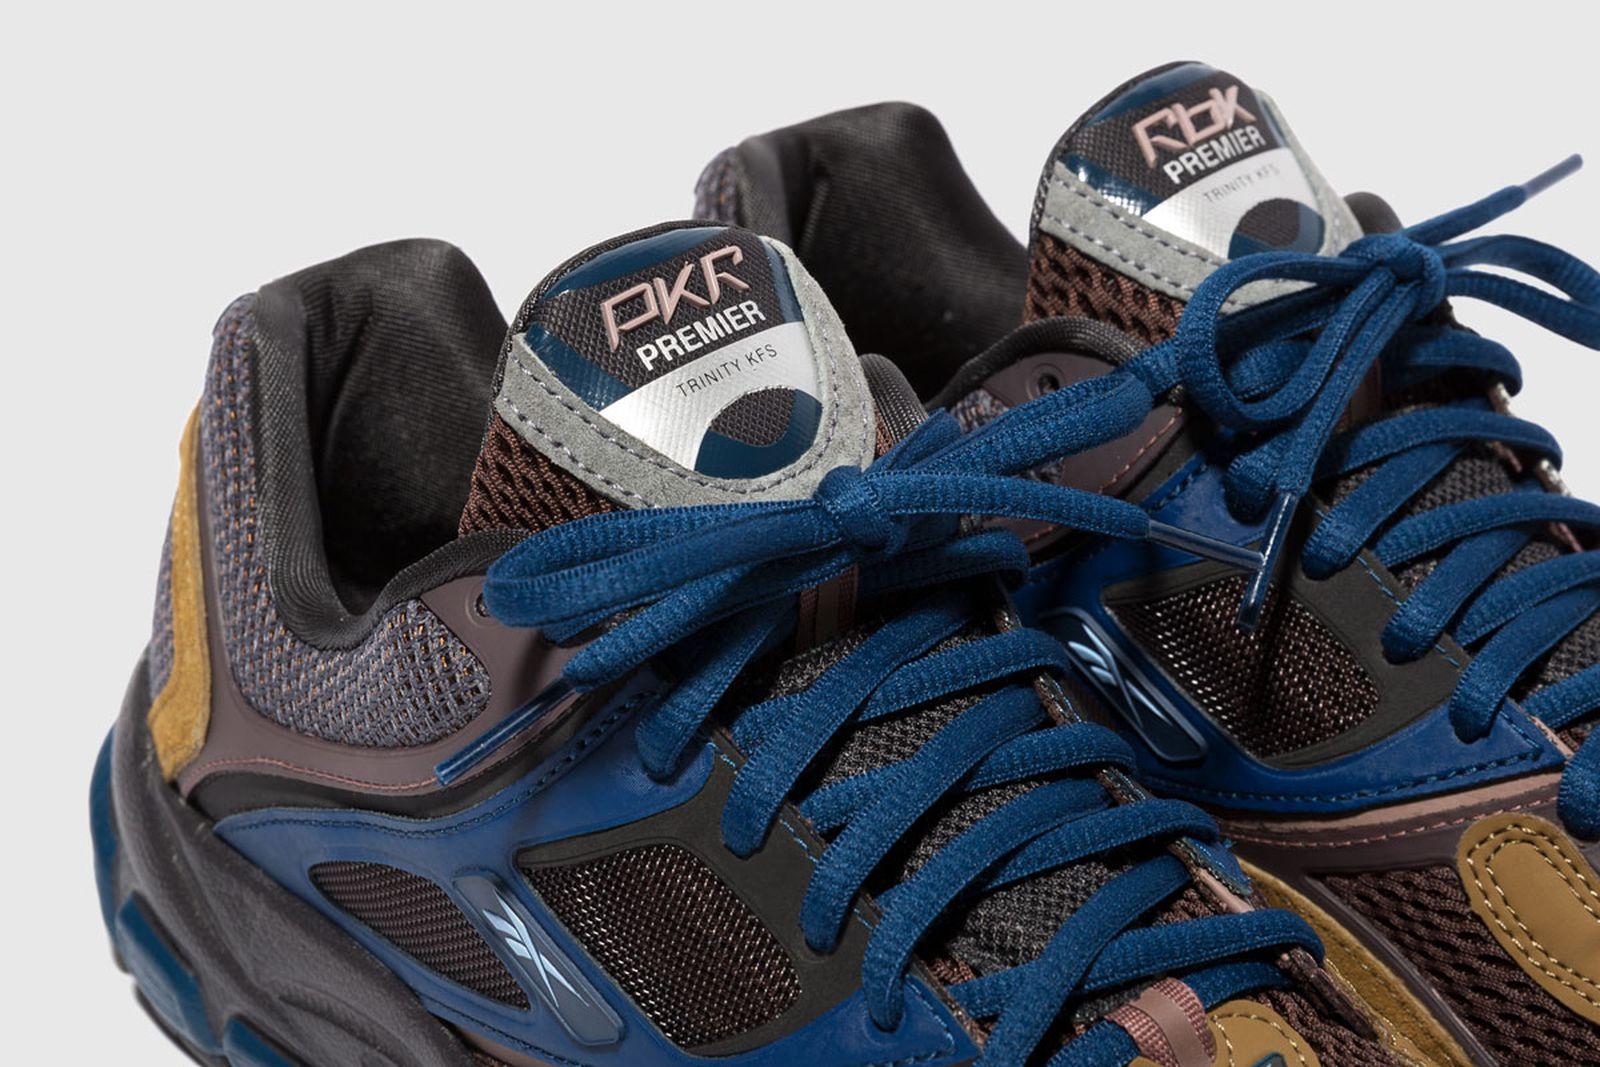 packer-x-reebok-trinity-premier-release-date-price-brown-04